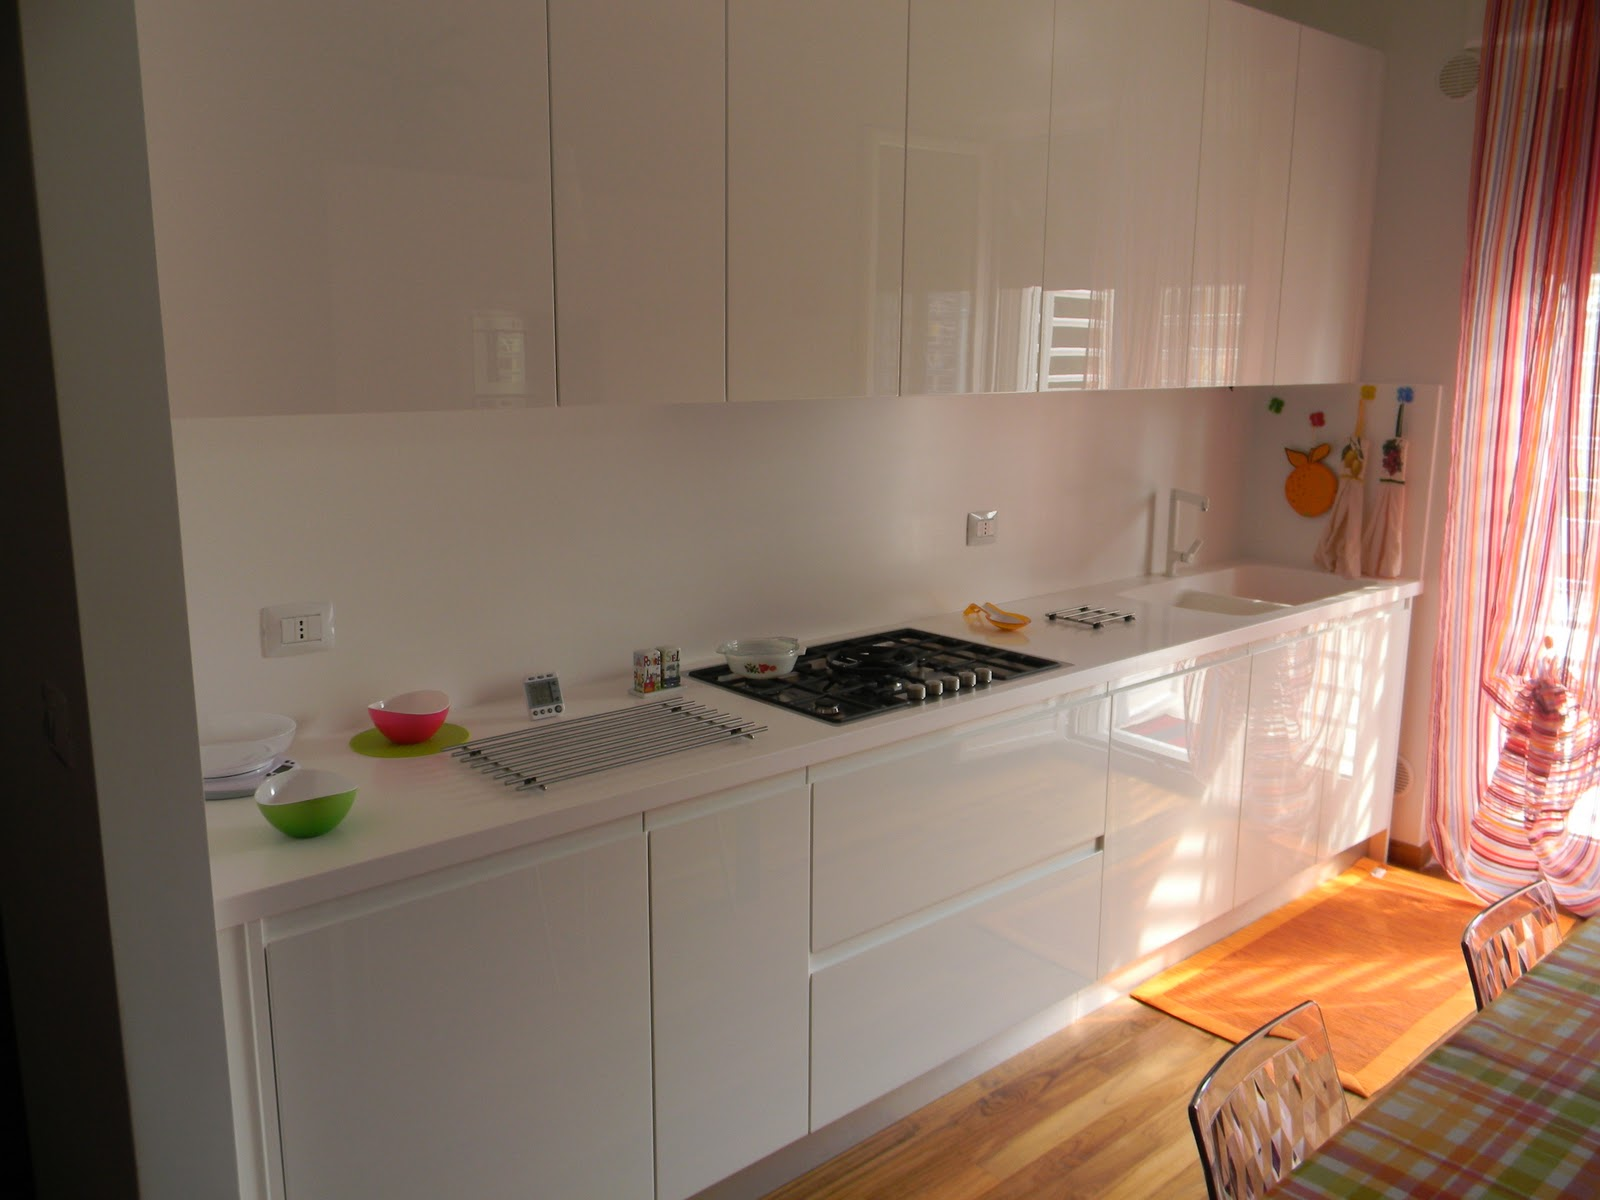 Stunning Cucine Ikea 2012 Photos - Home Design - joygree.info